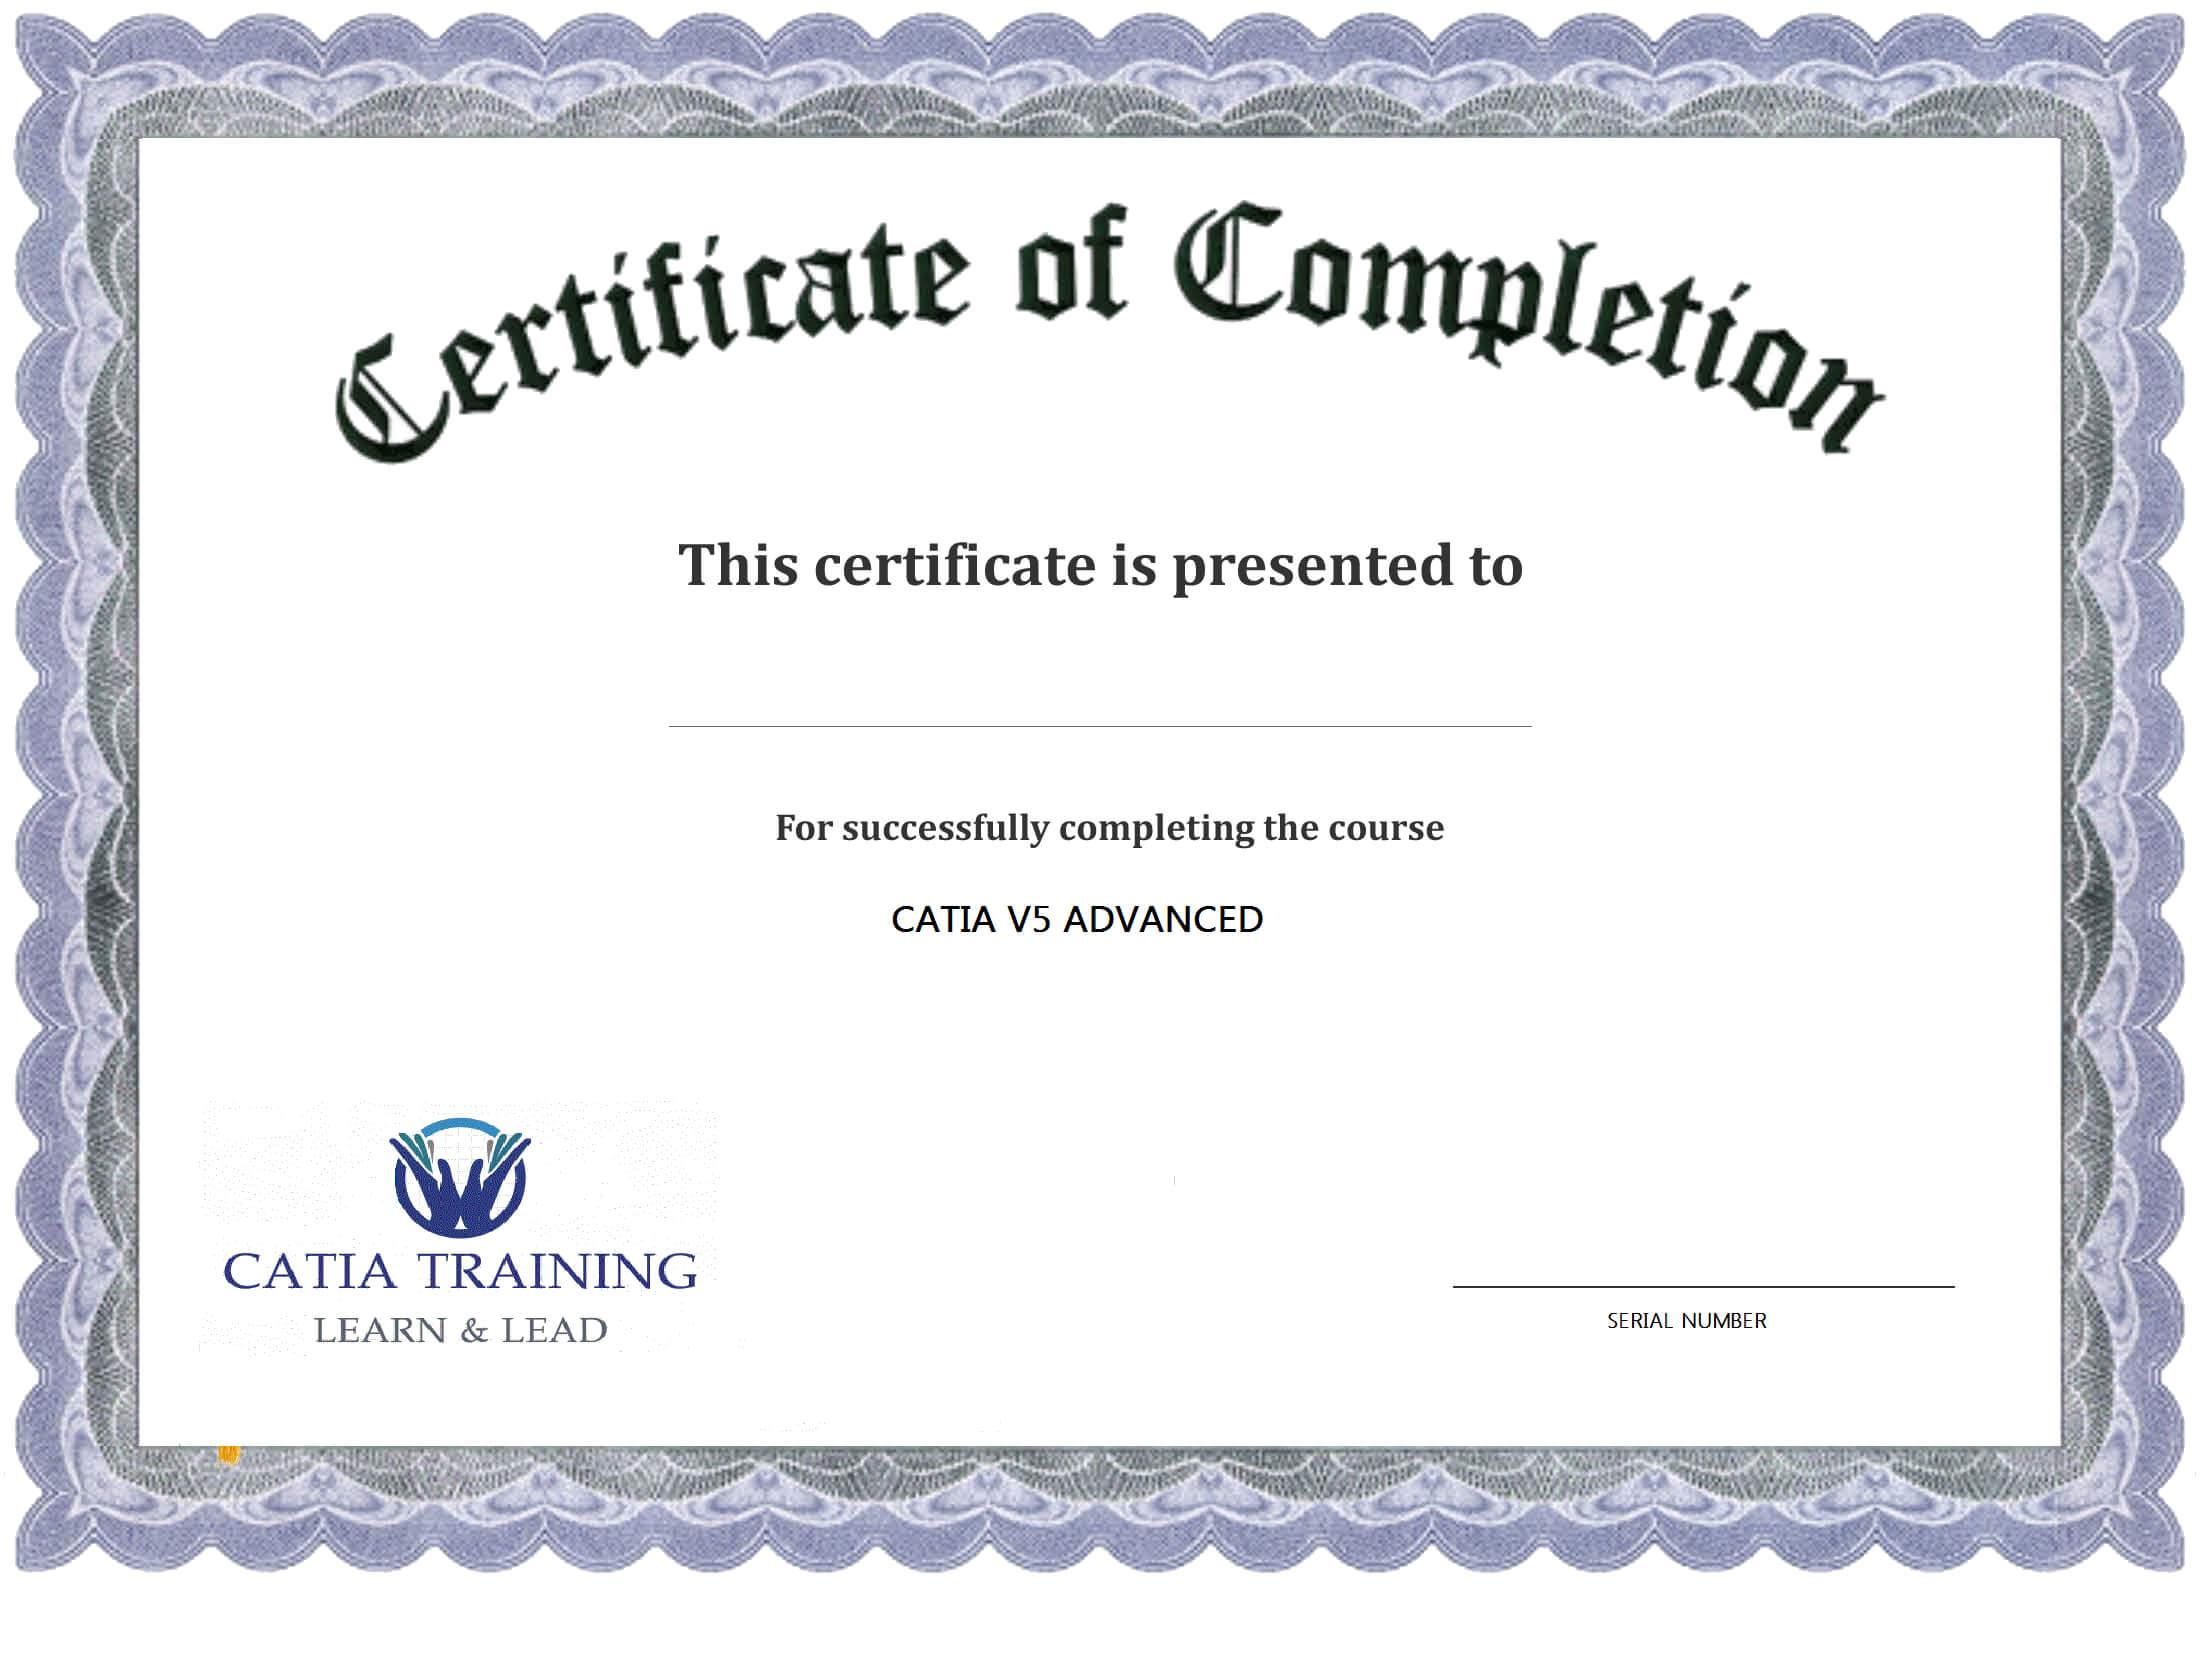 Participation Certificate Template Word – Yupar.magdalene For Certificate Templates For Word Free Downloads